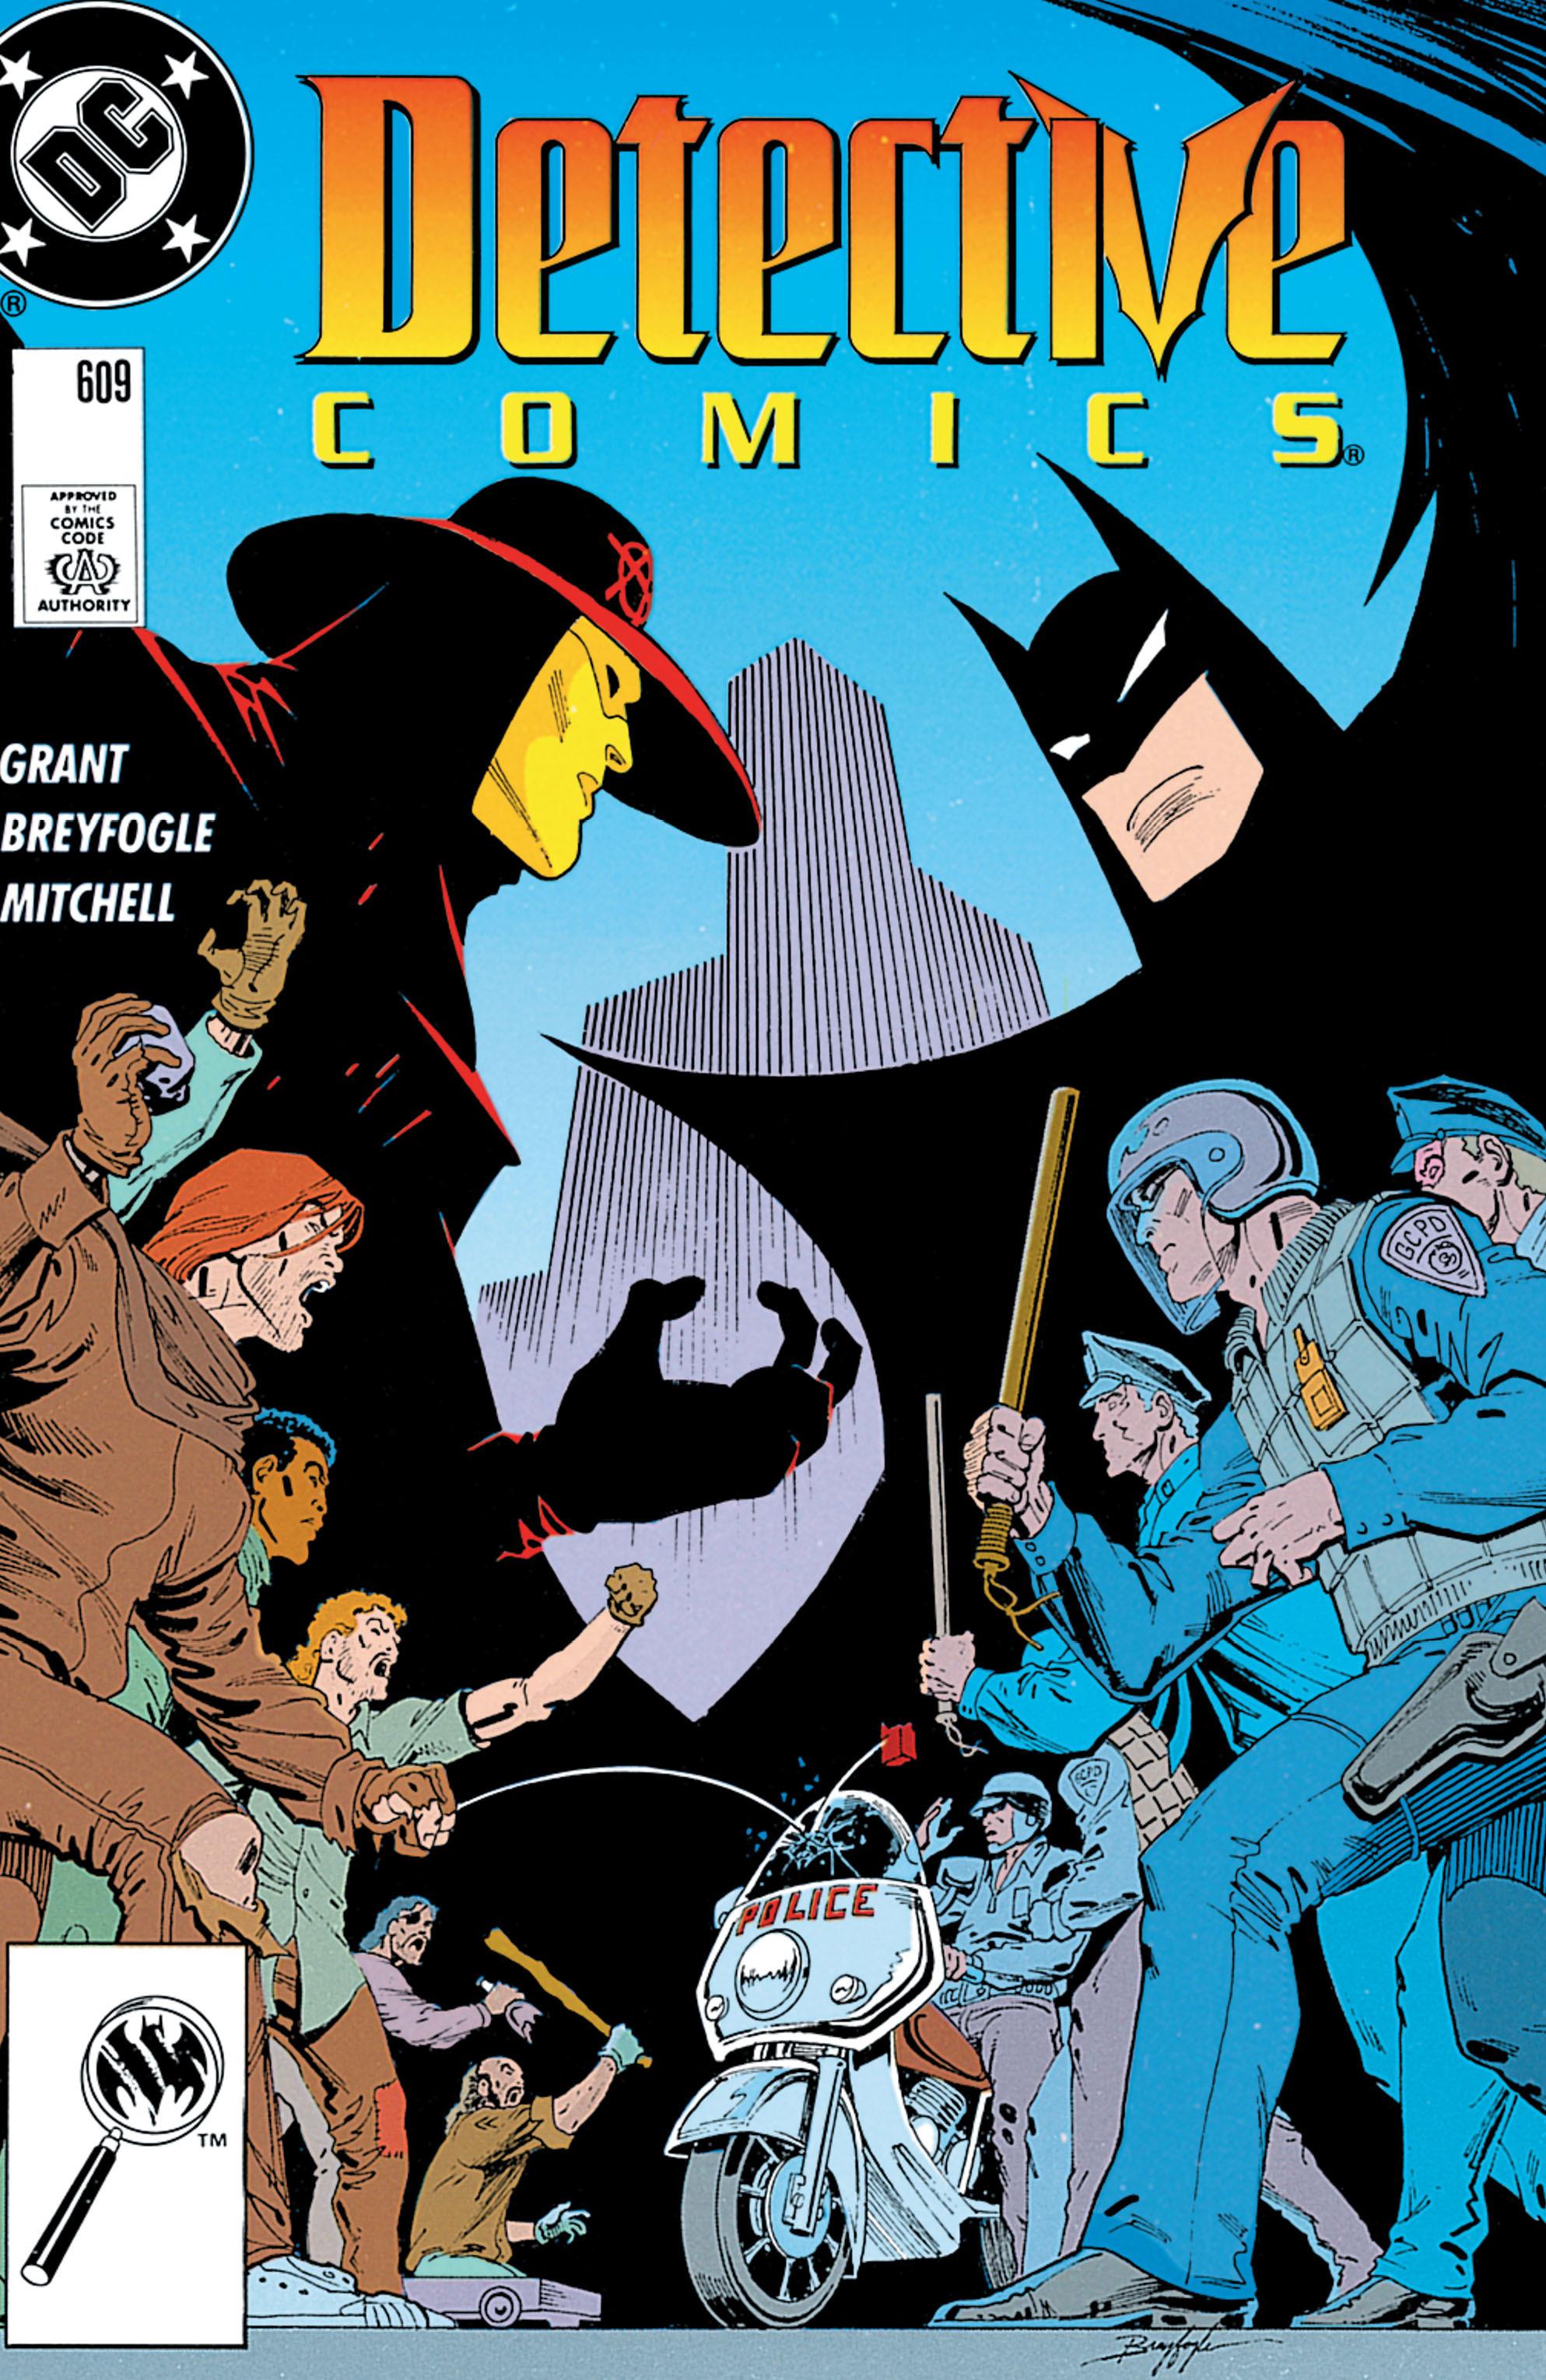 Detective Comics (1937) 609 Page 1